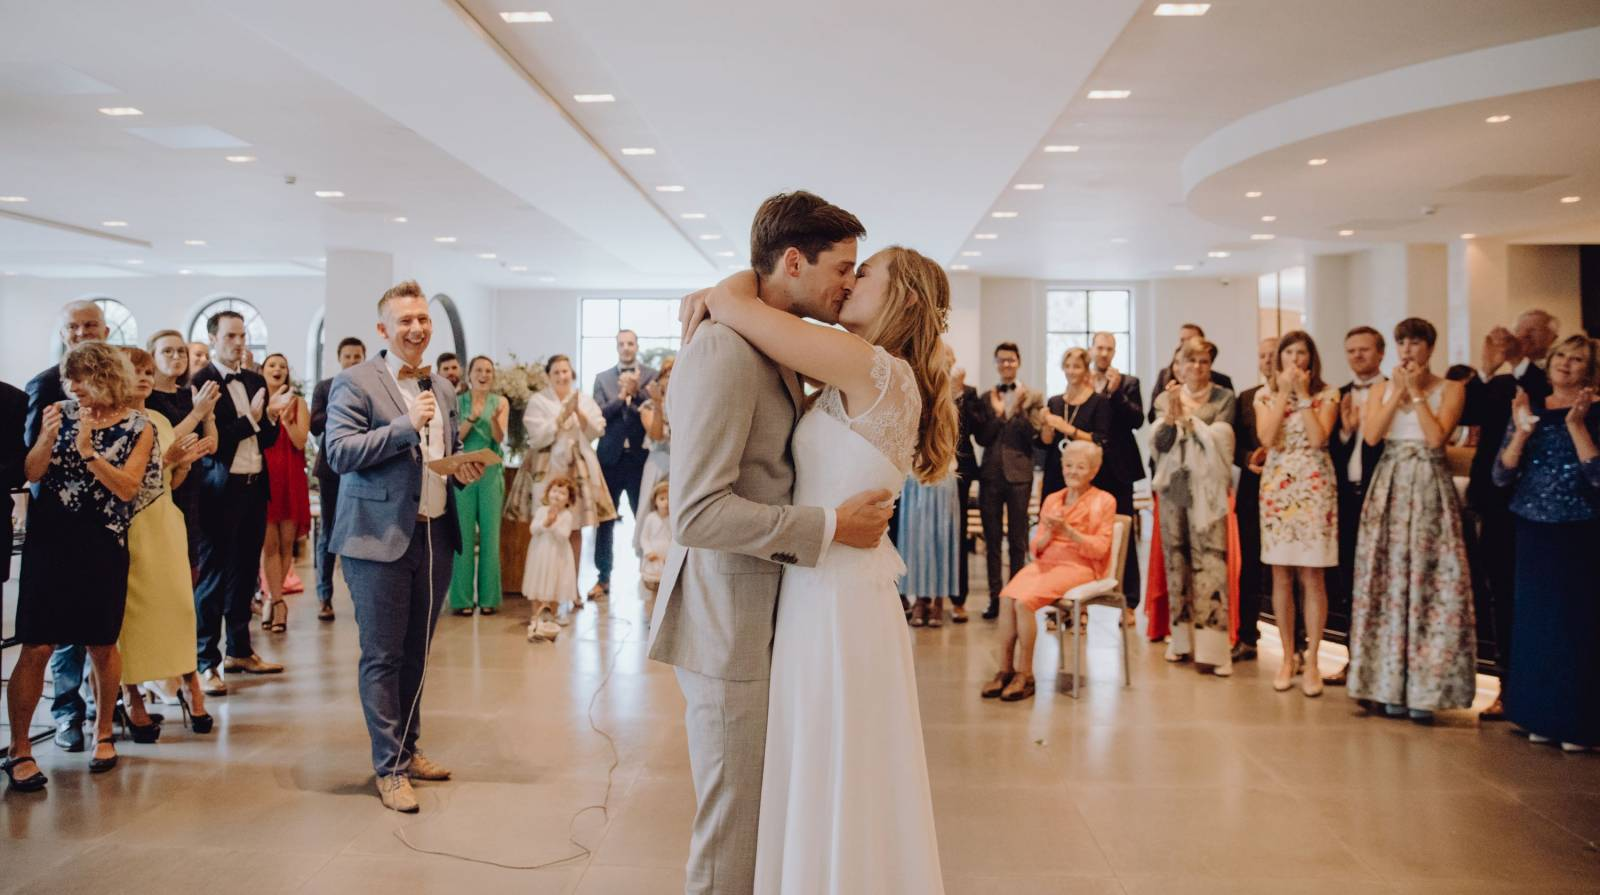 Live 4 Love - Ceremoniespreker - House of Weddings - 22